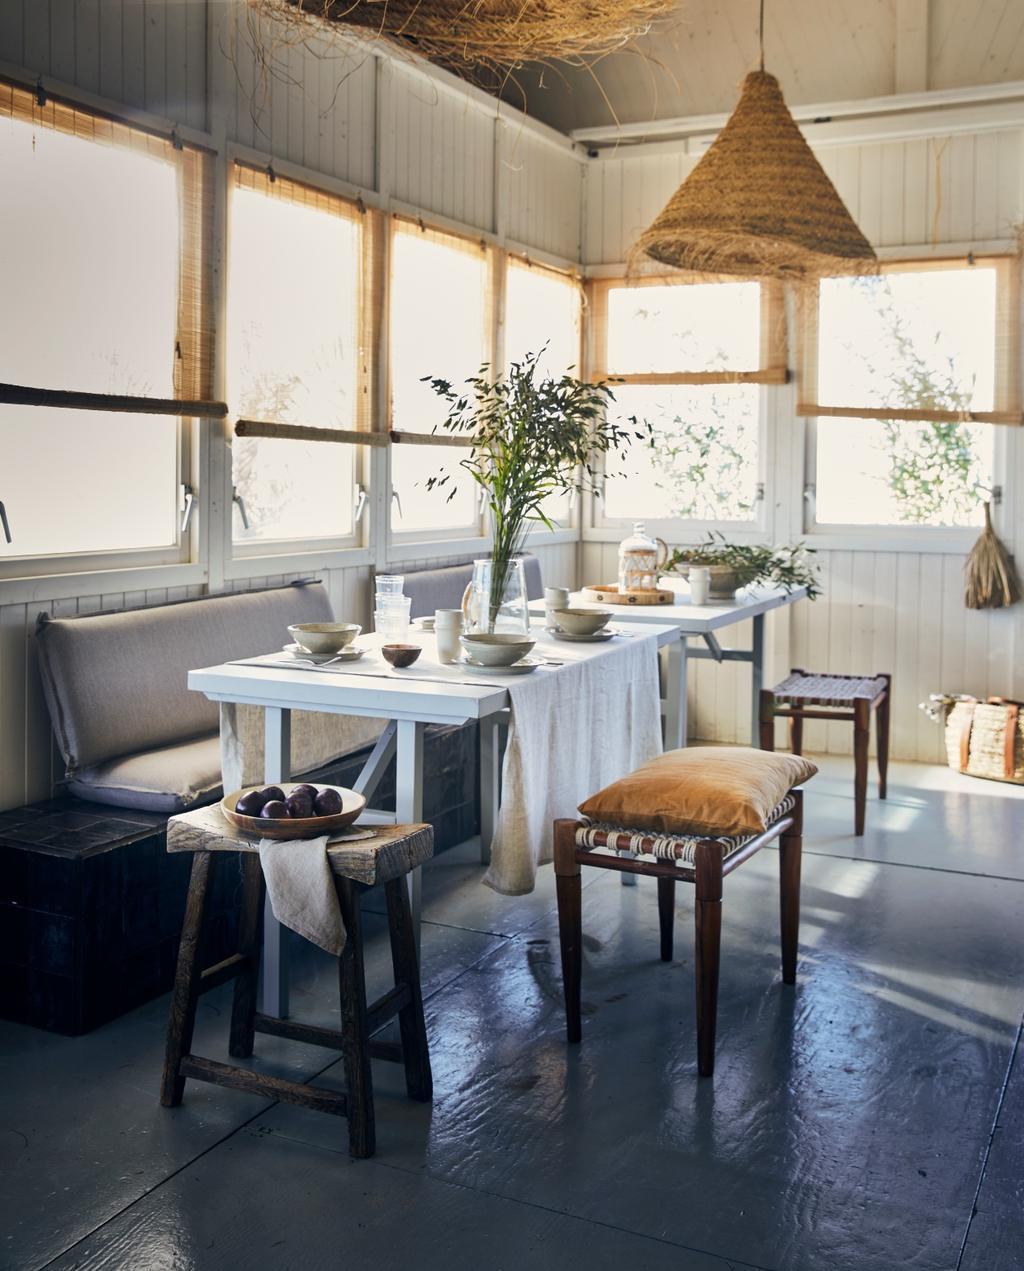 vtwonen styling 06-2020 strand ajuma lange eettafel met krukken en stoelen